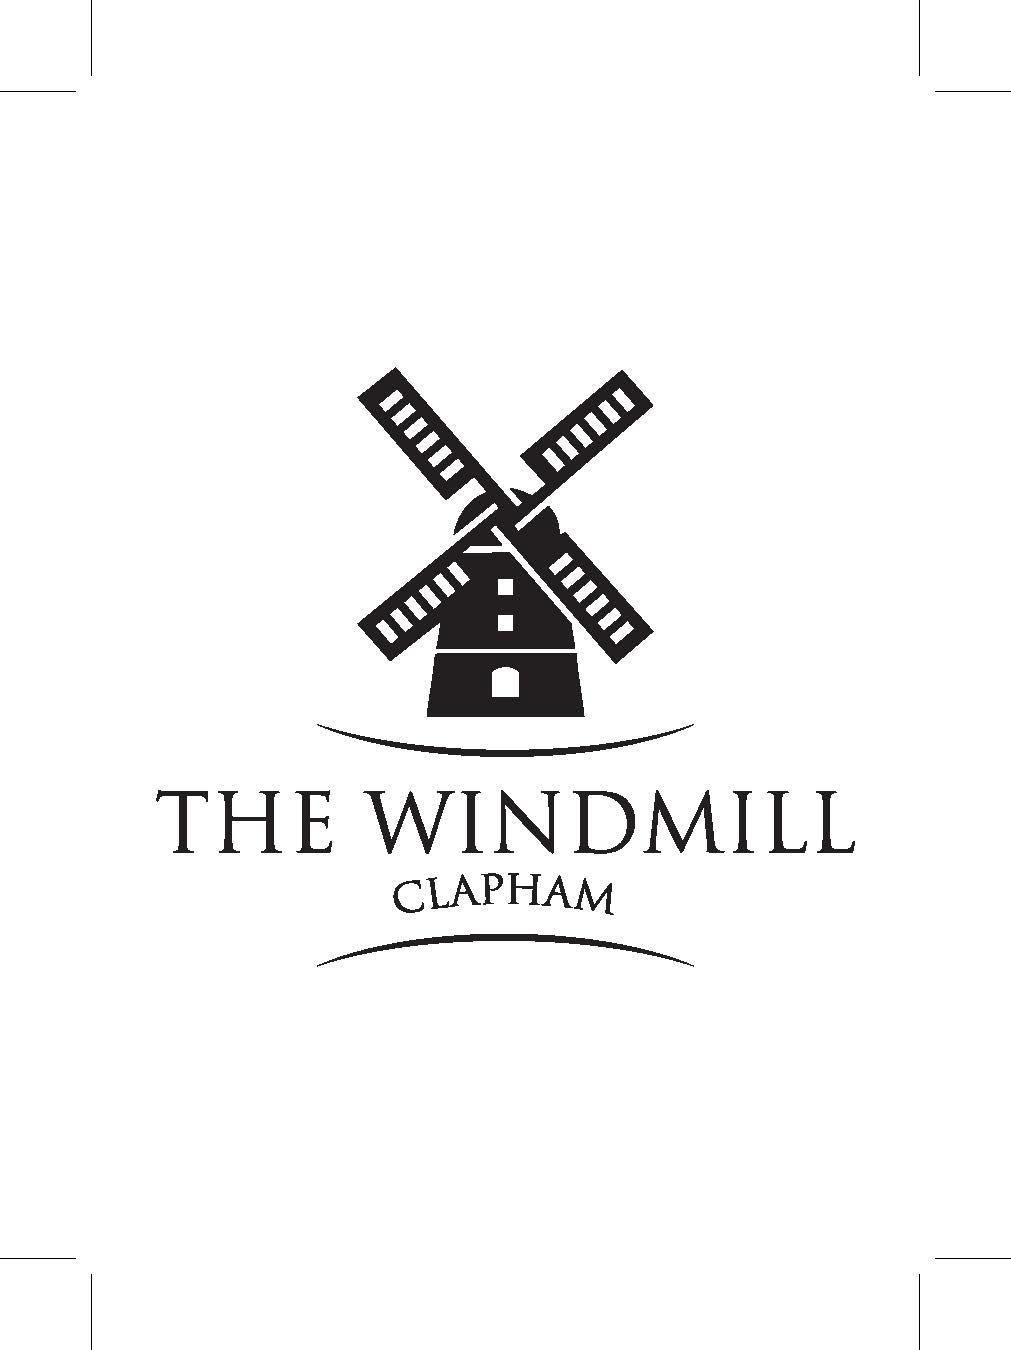 Windmill_Clapham pub stamp